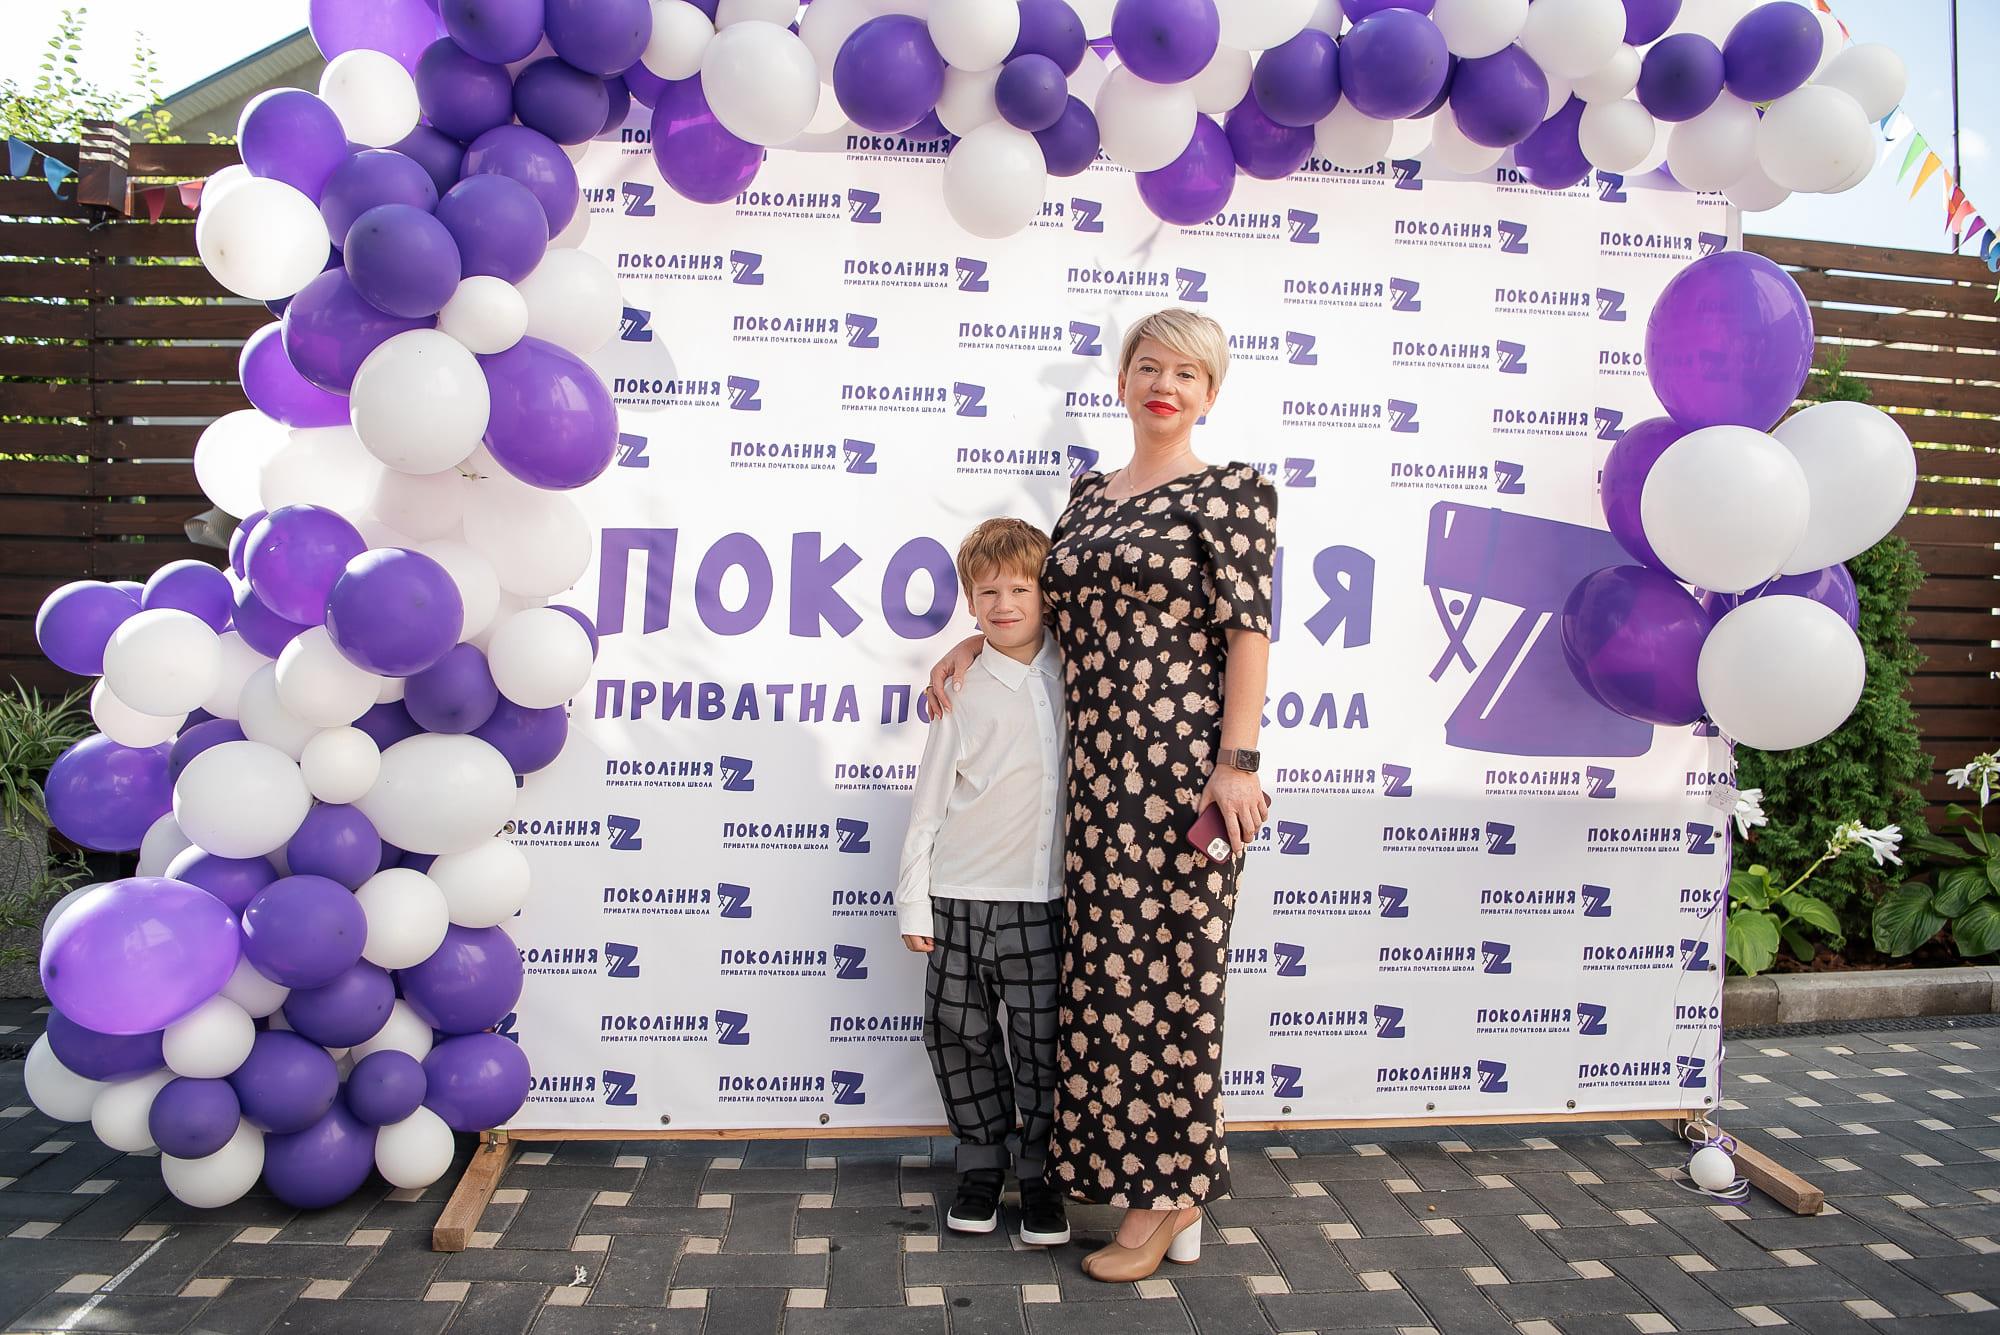 https://akademia-detstva.od.ua/app/uploads/2021/09/6.jpg